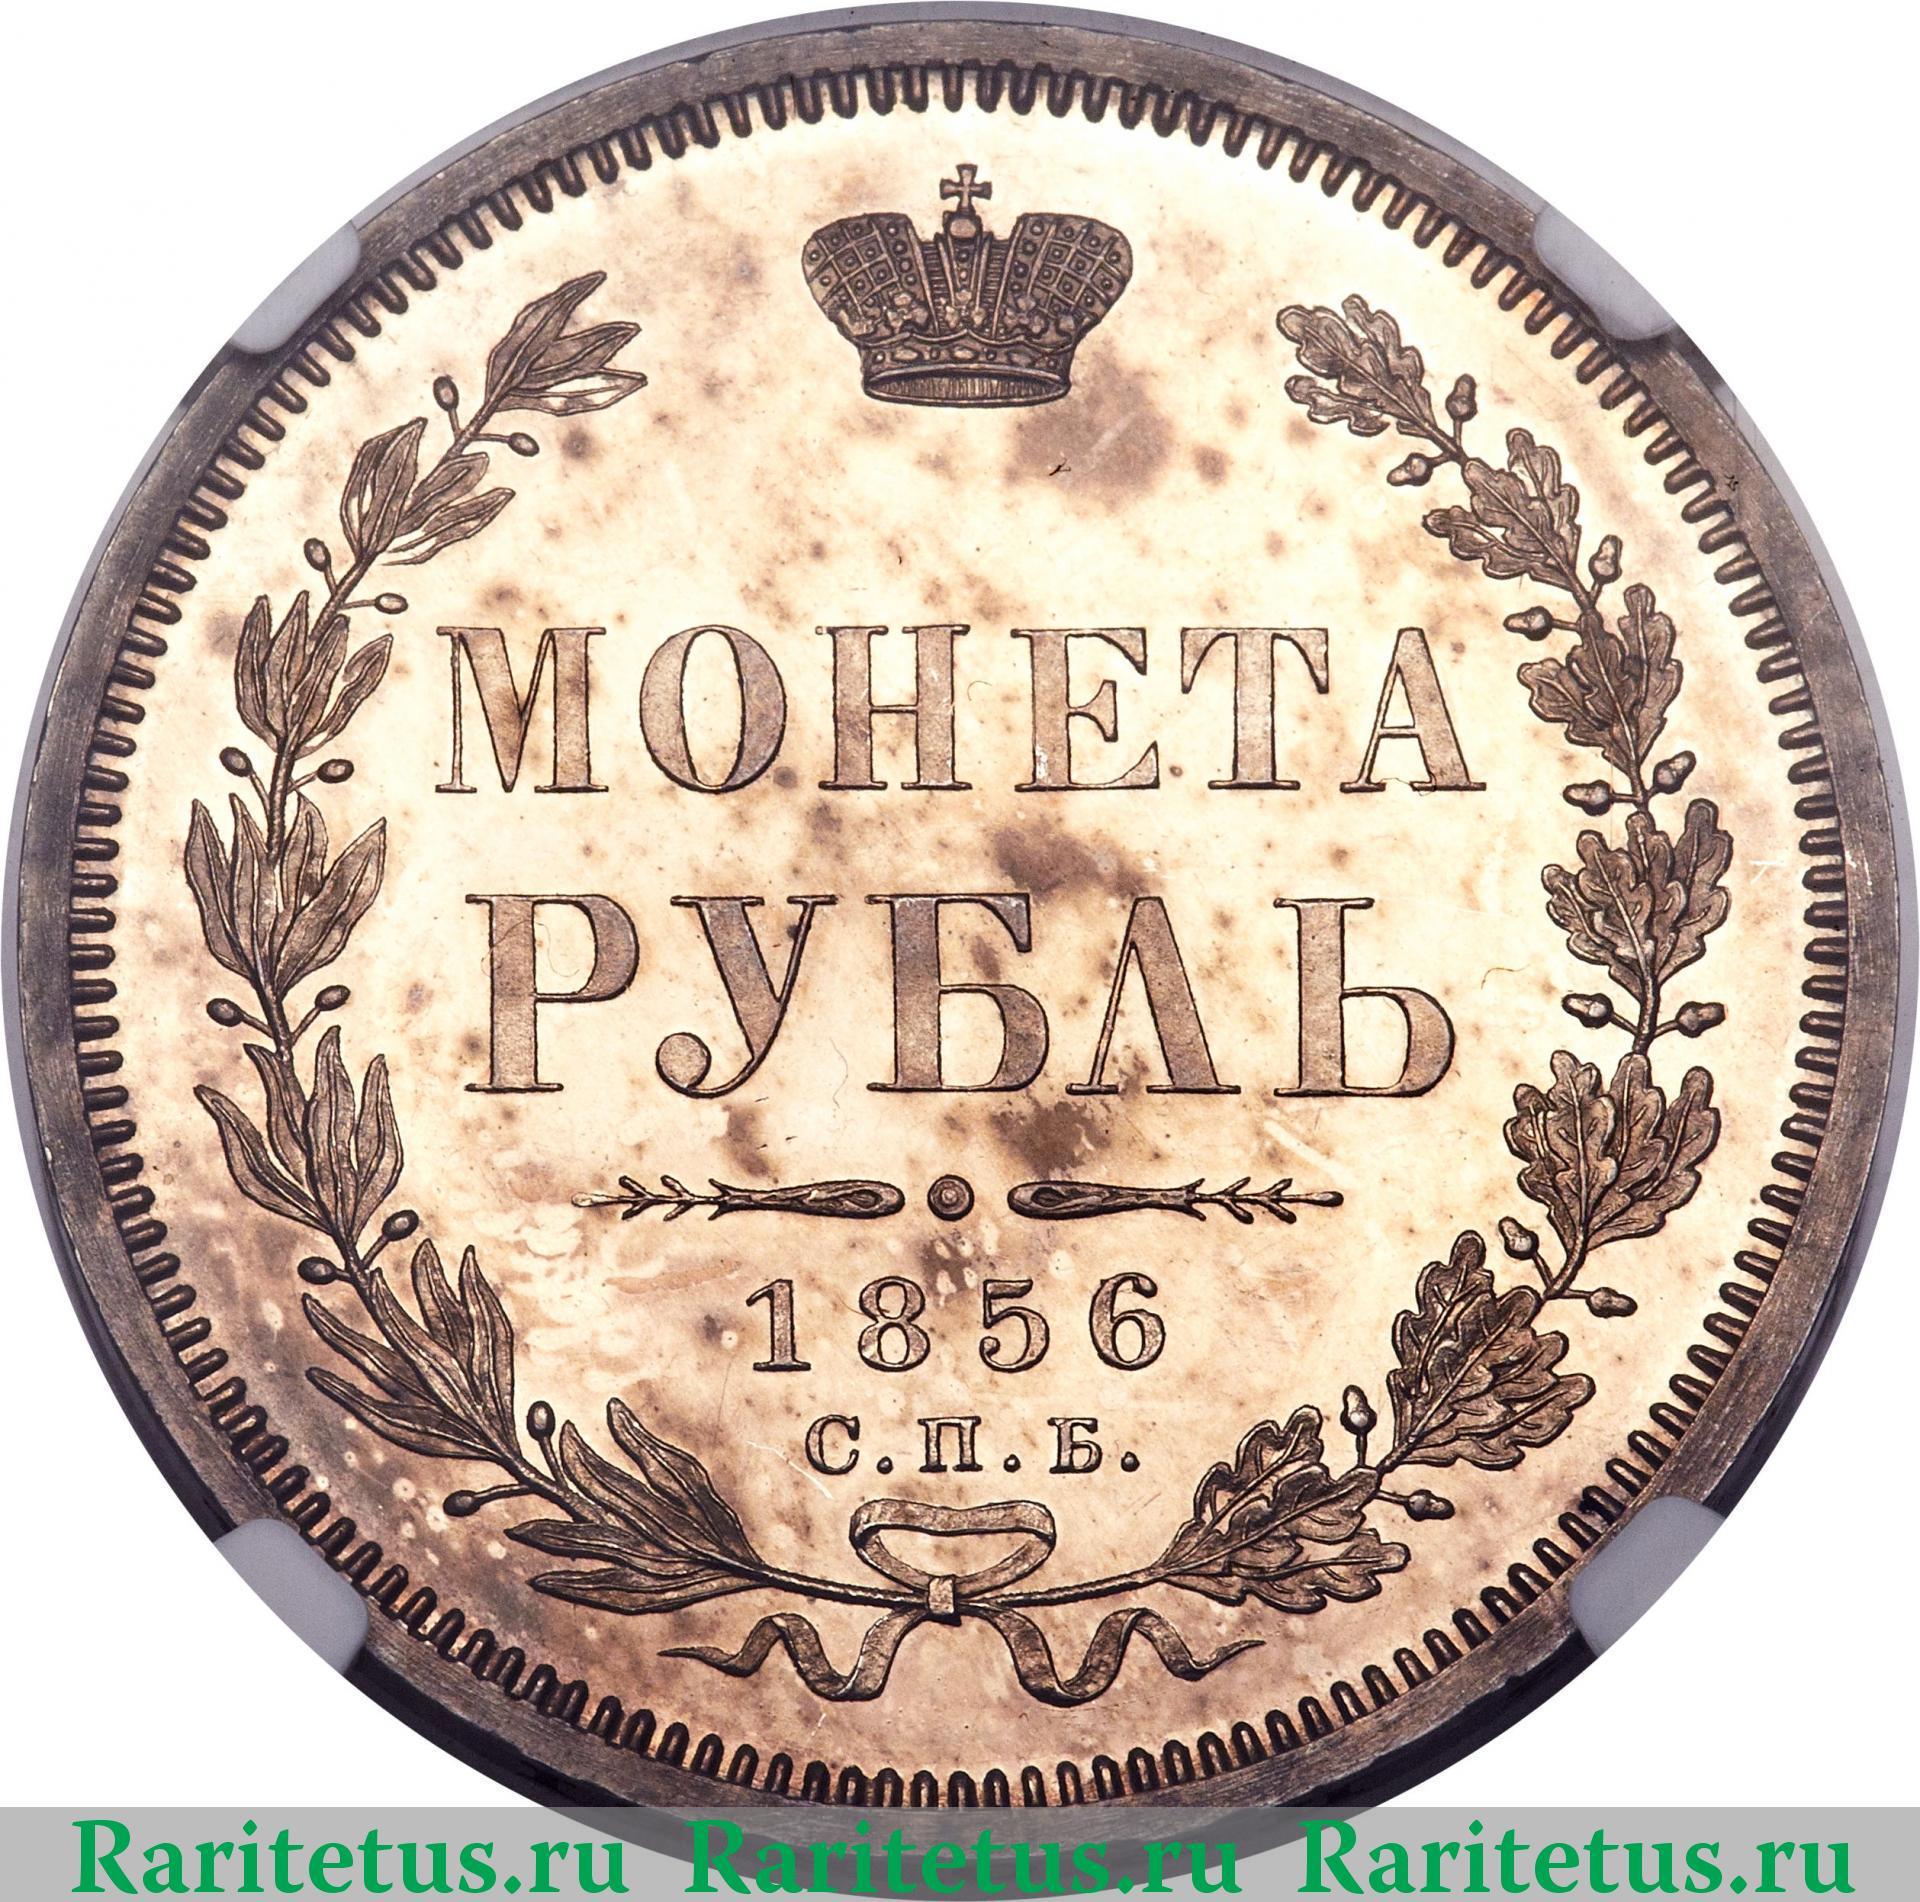 Монеты 1856 года 10 euro caravaggio